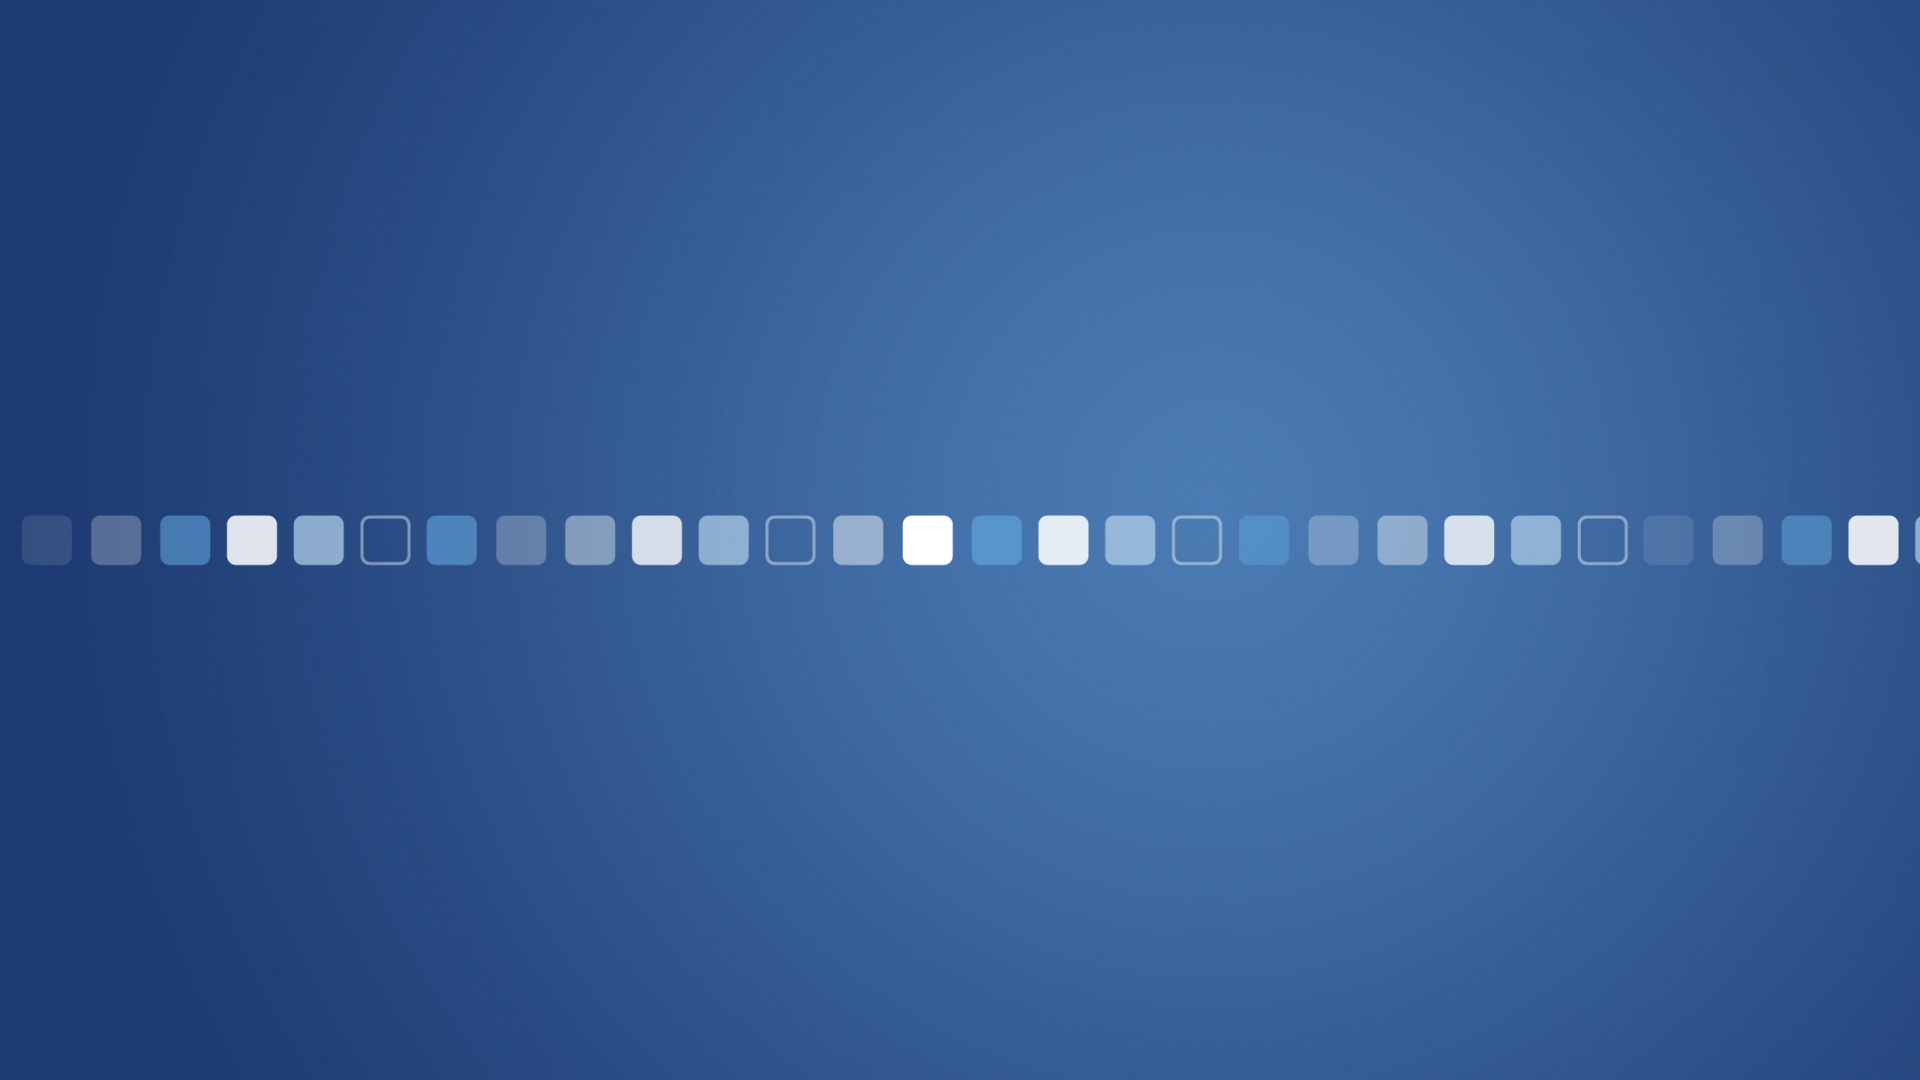 Hd Anime Wallpaper For Horizontal Squares Minimalistic